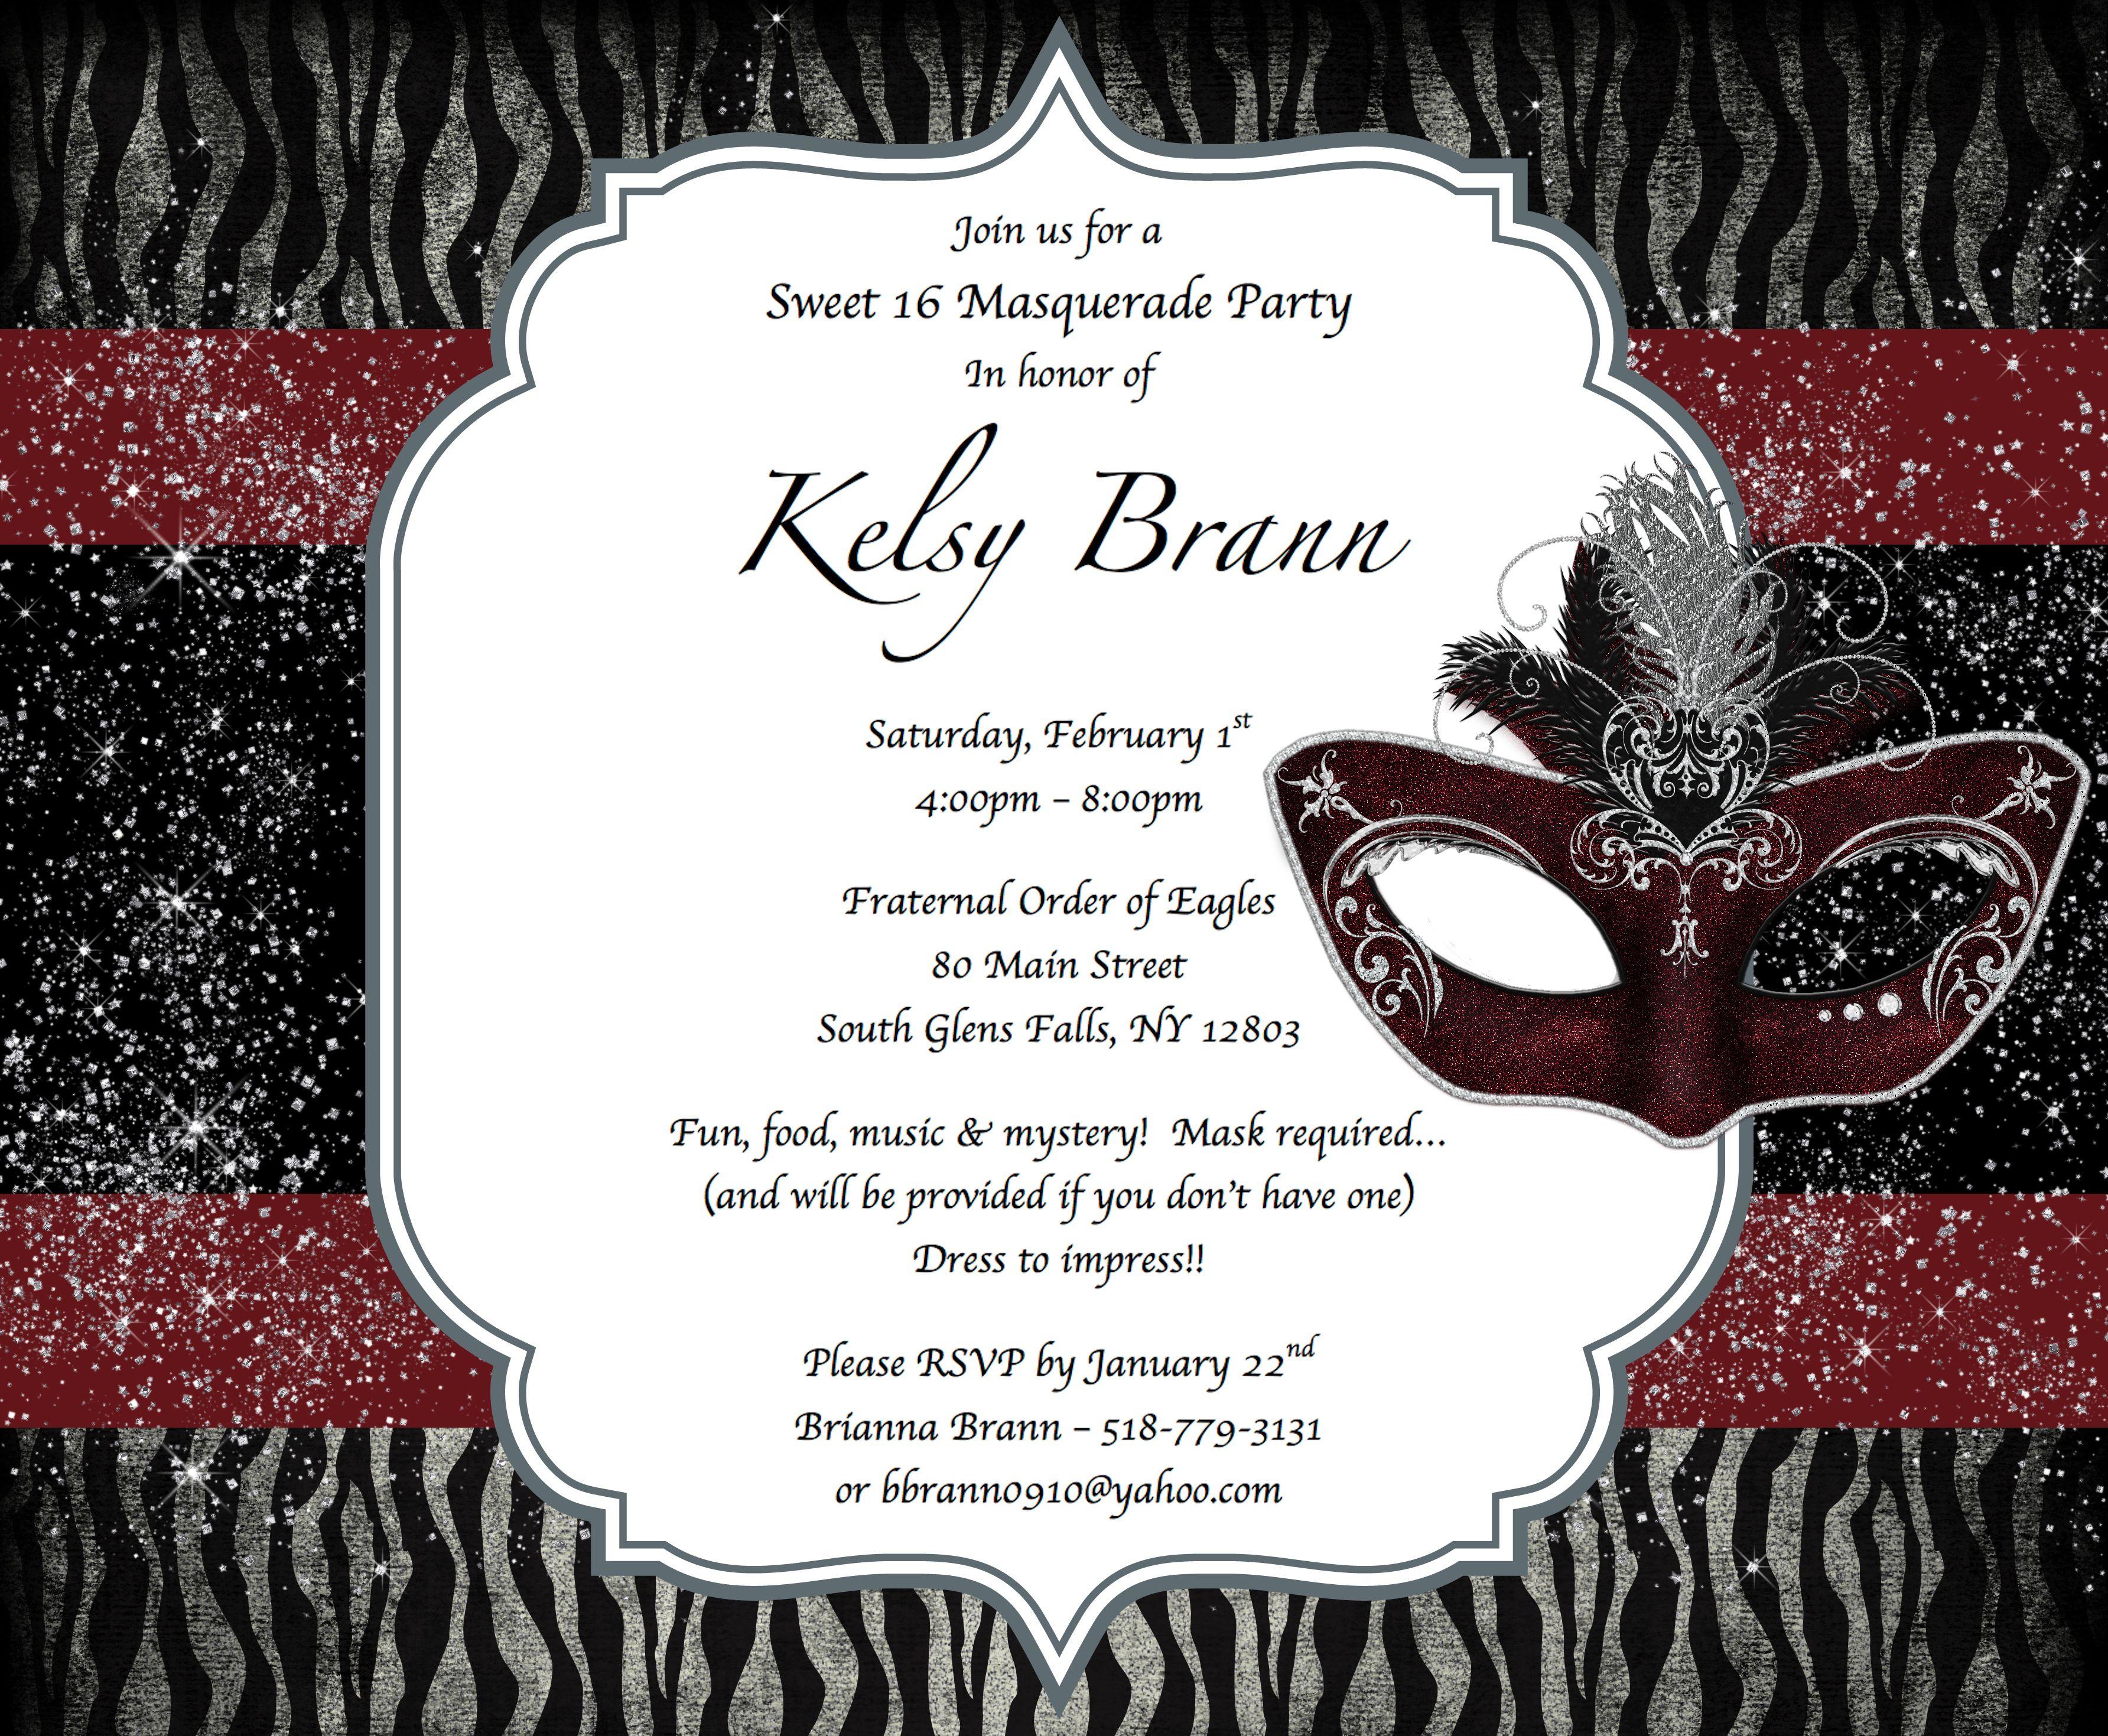 Sweet 16 masquerade party invitations – Masquerade Party Invitation Ideas